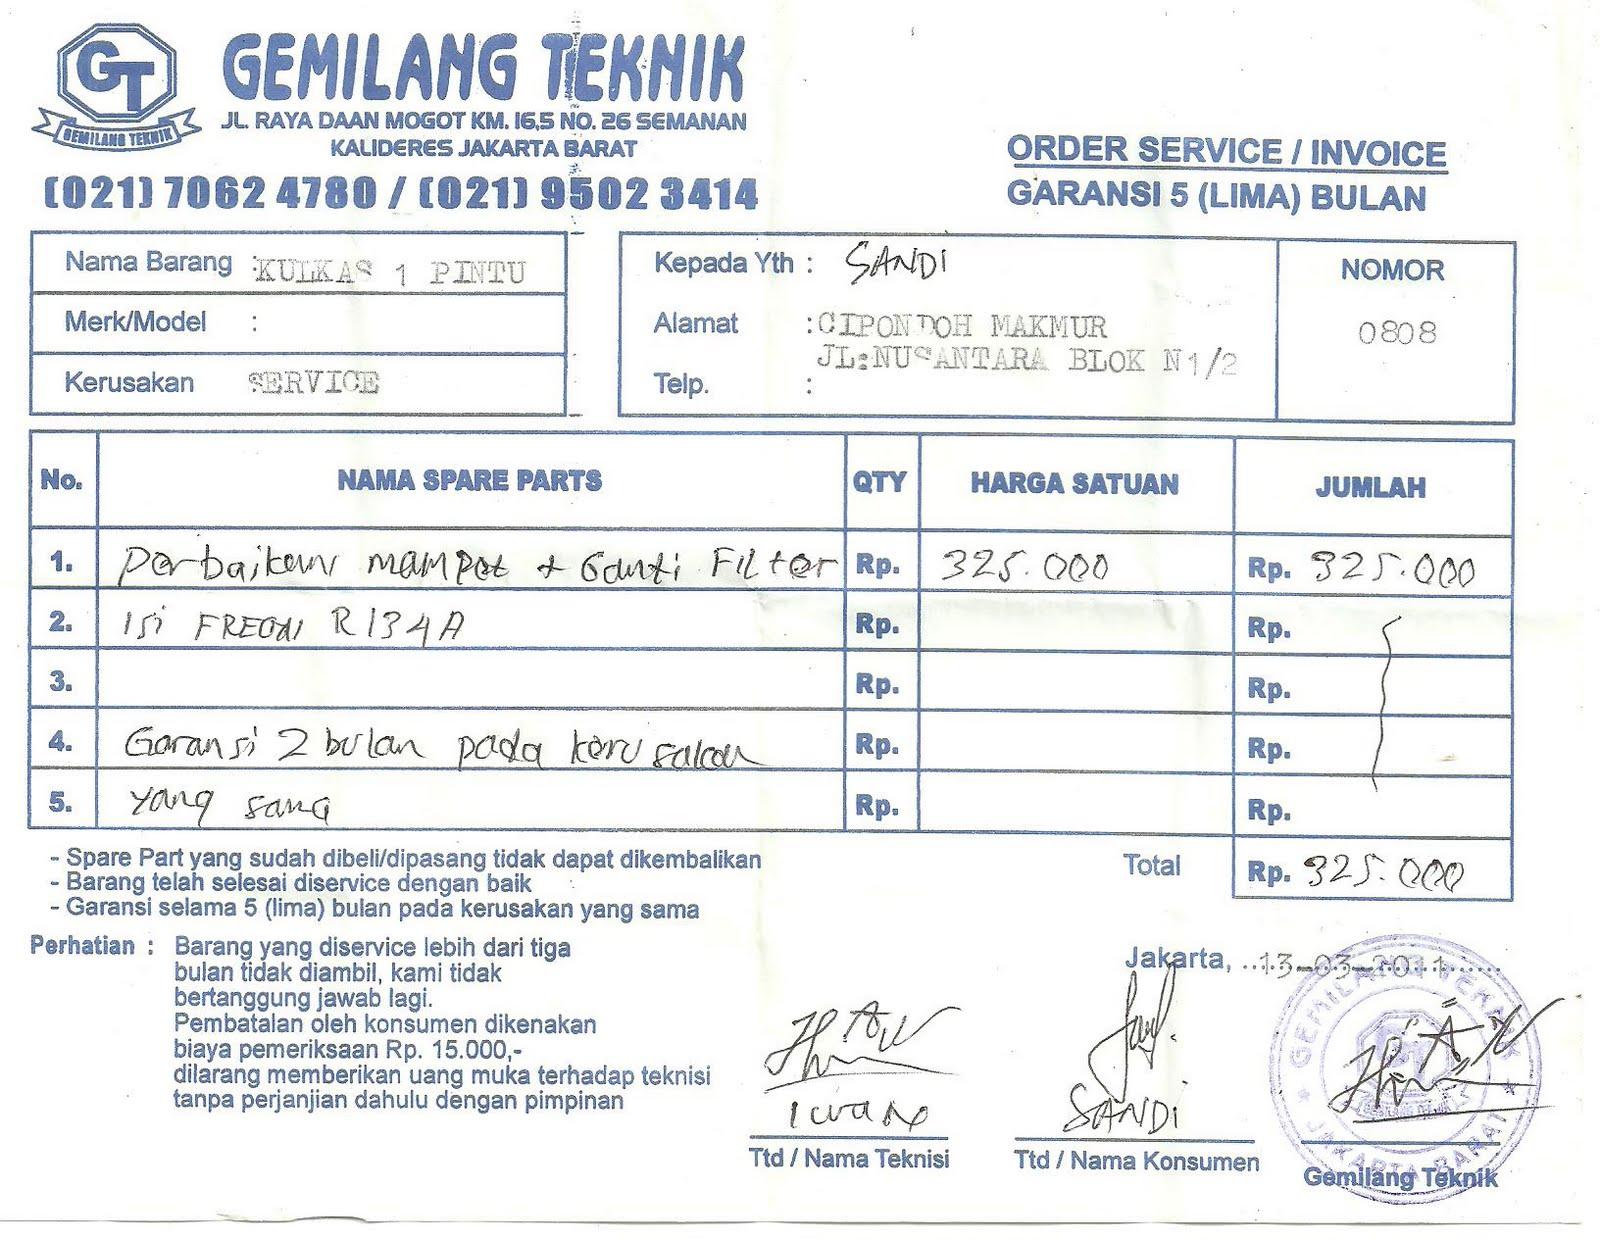 Gado Gado Gudang Kuitansi Servis Kulkas